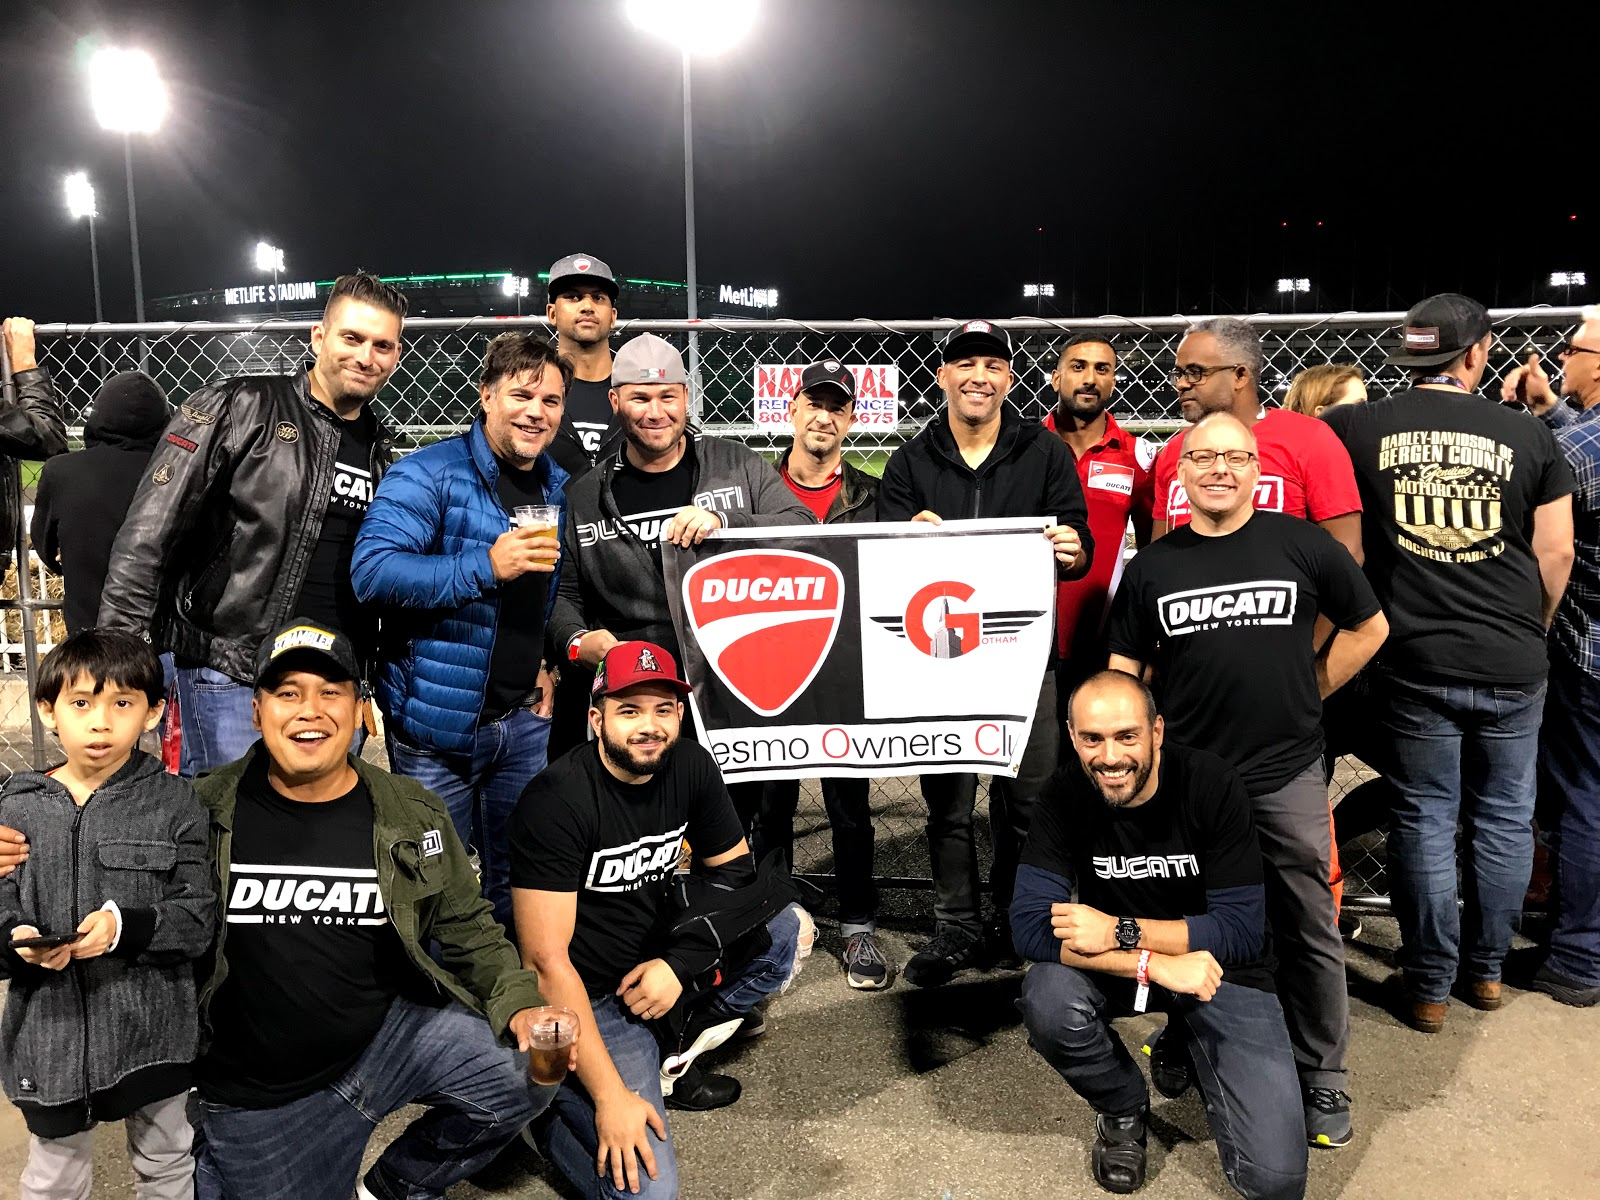 Tigh Loughhead of Gotham Ducati and Steve Radt of Ducati New York at American Flat Track